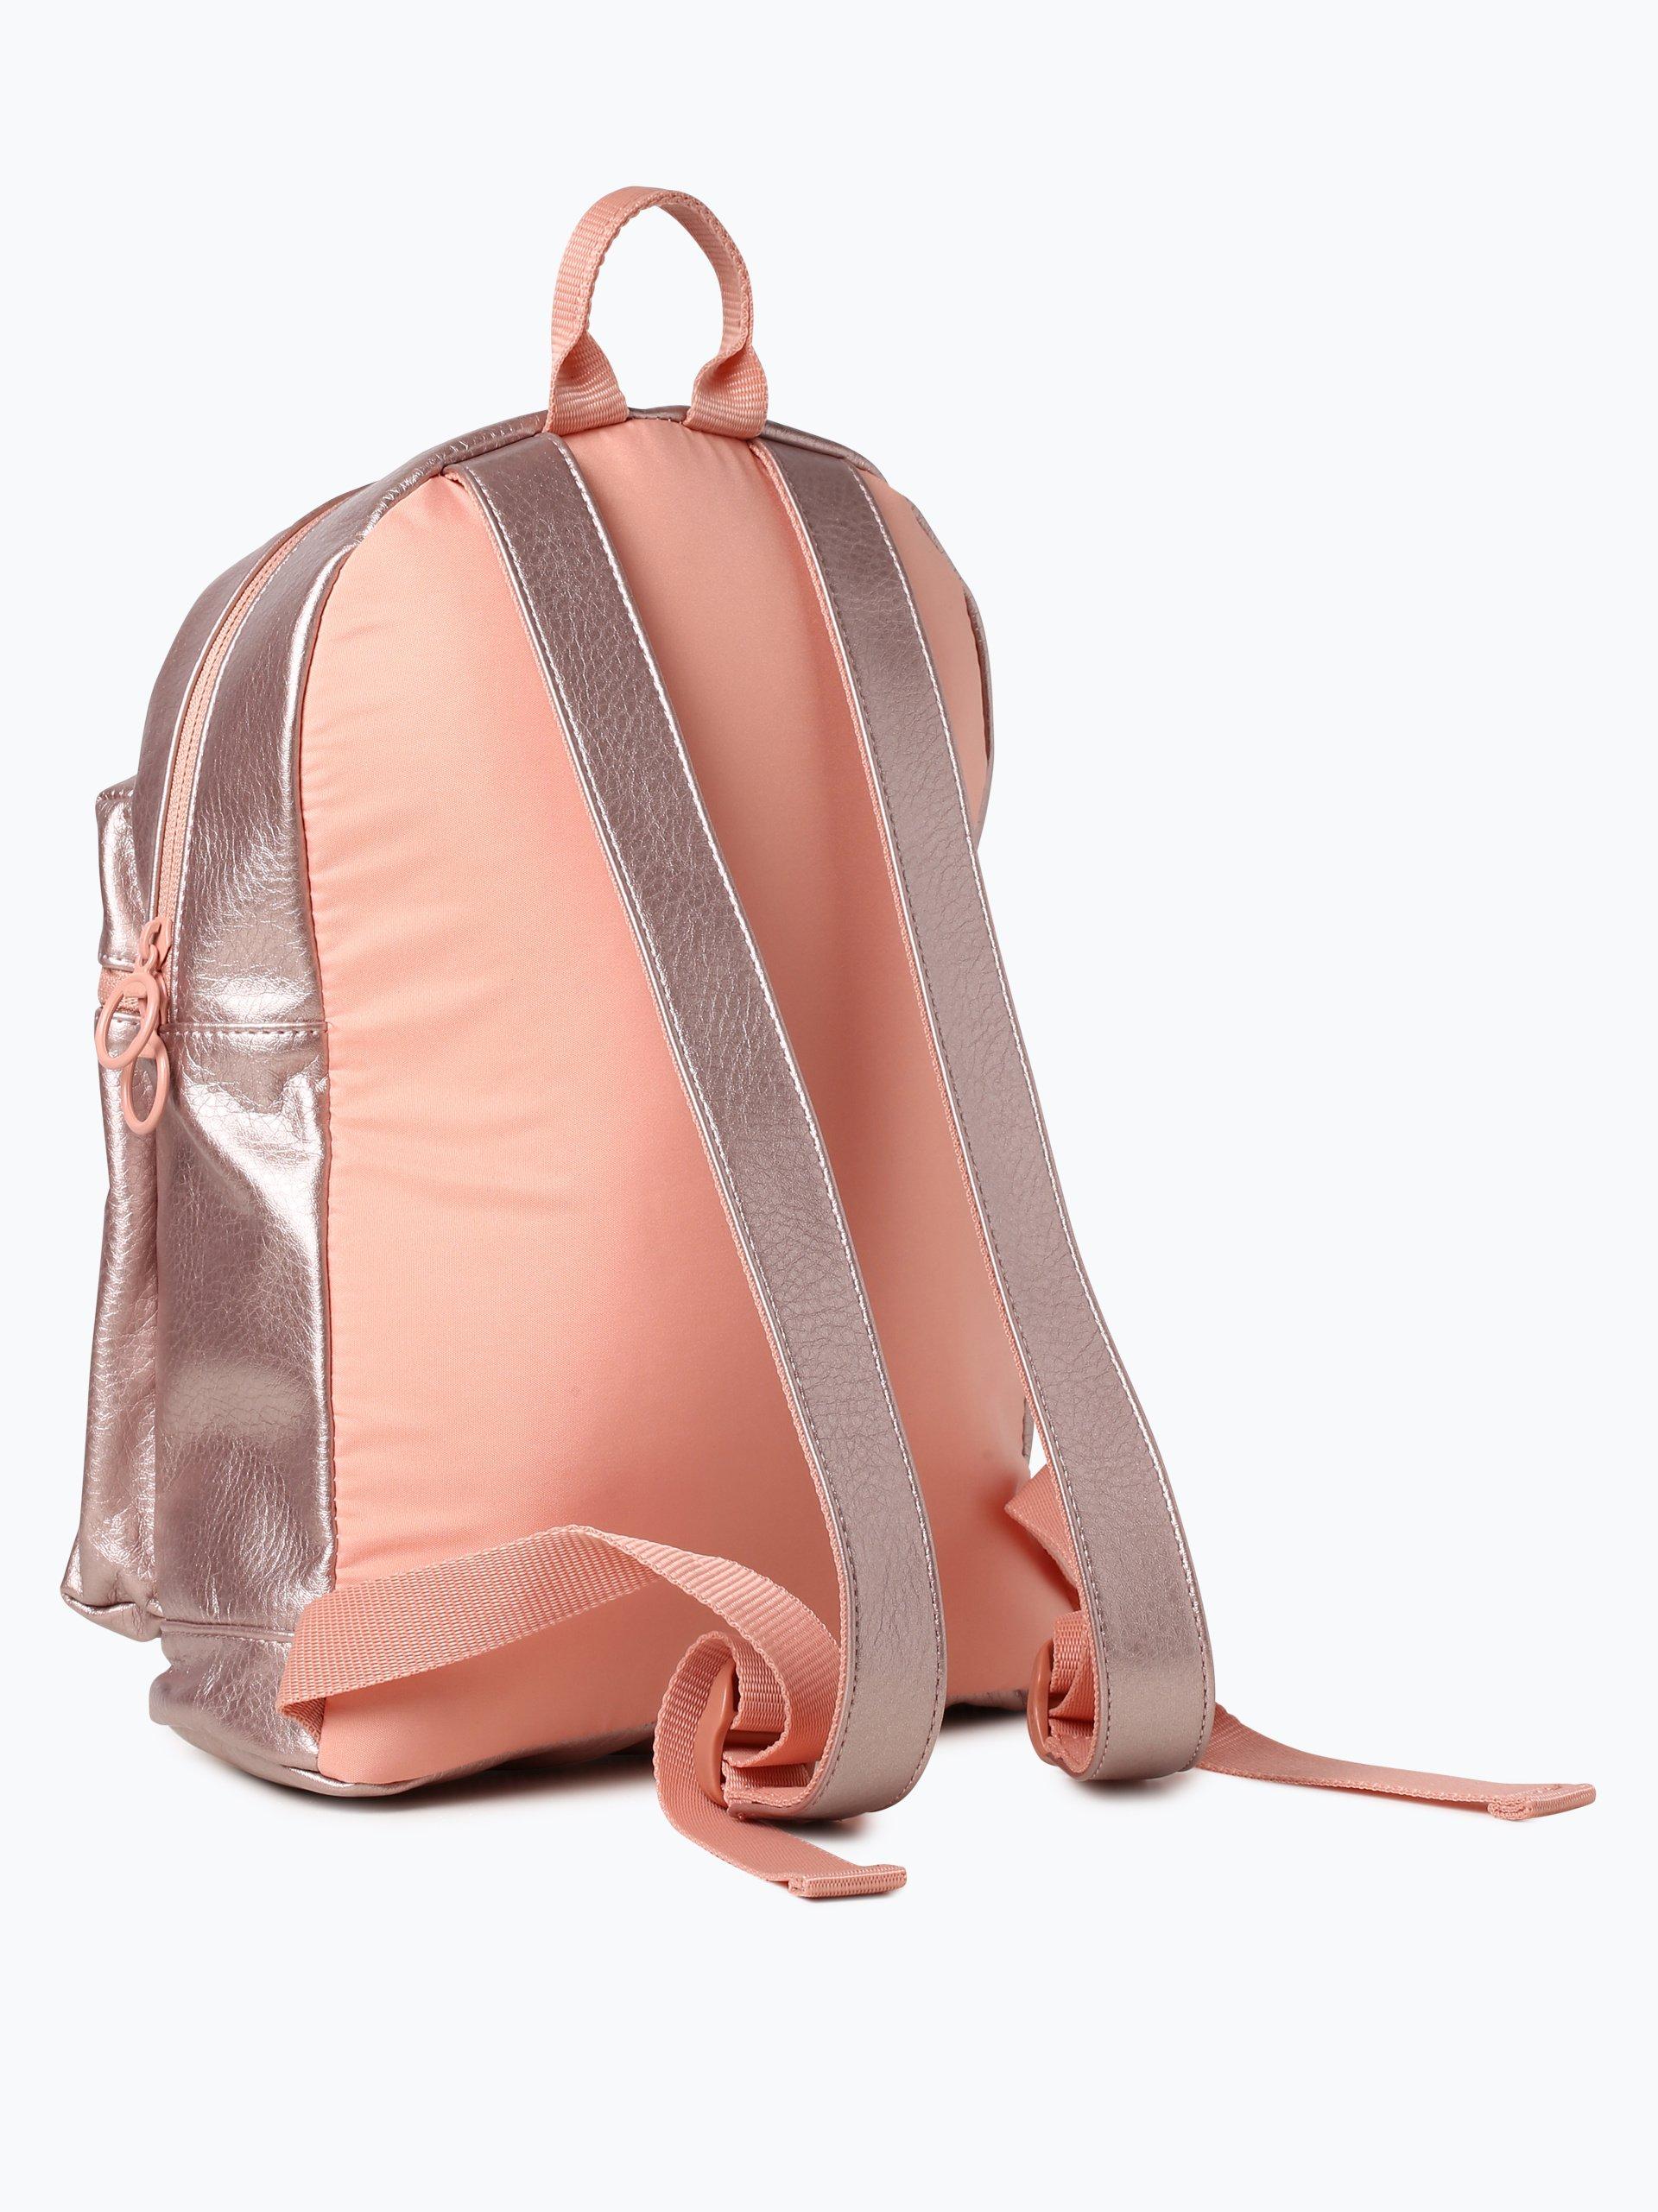 puma damen rucksack rosa uni online kaufen vangraaf com. Black Bedroom Furniture Sets. Home Design Ideas